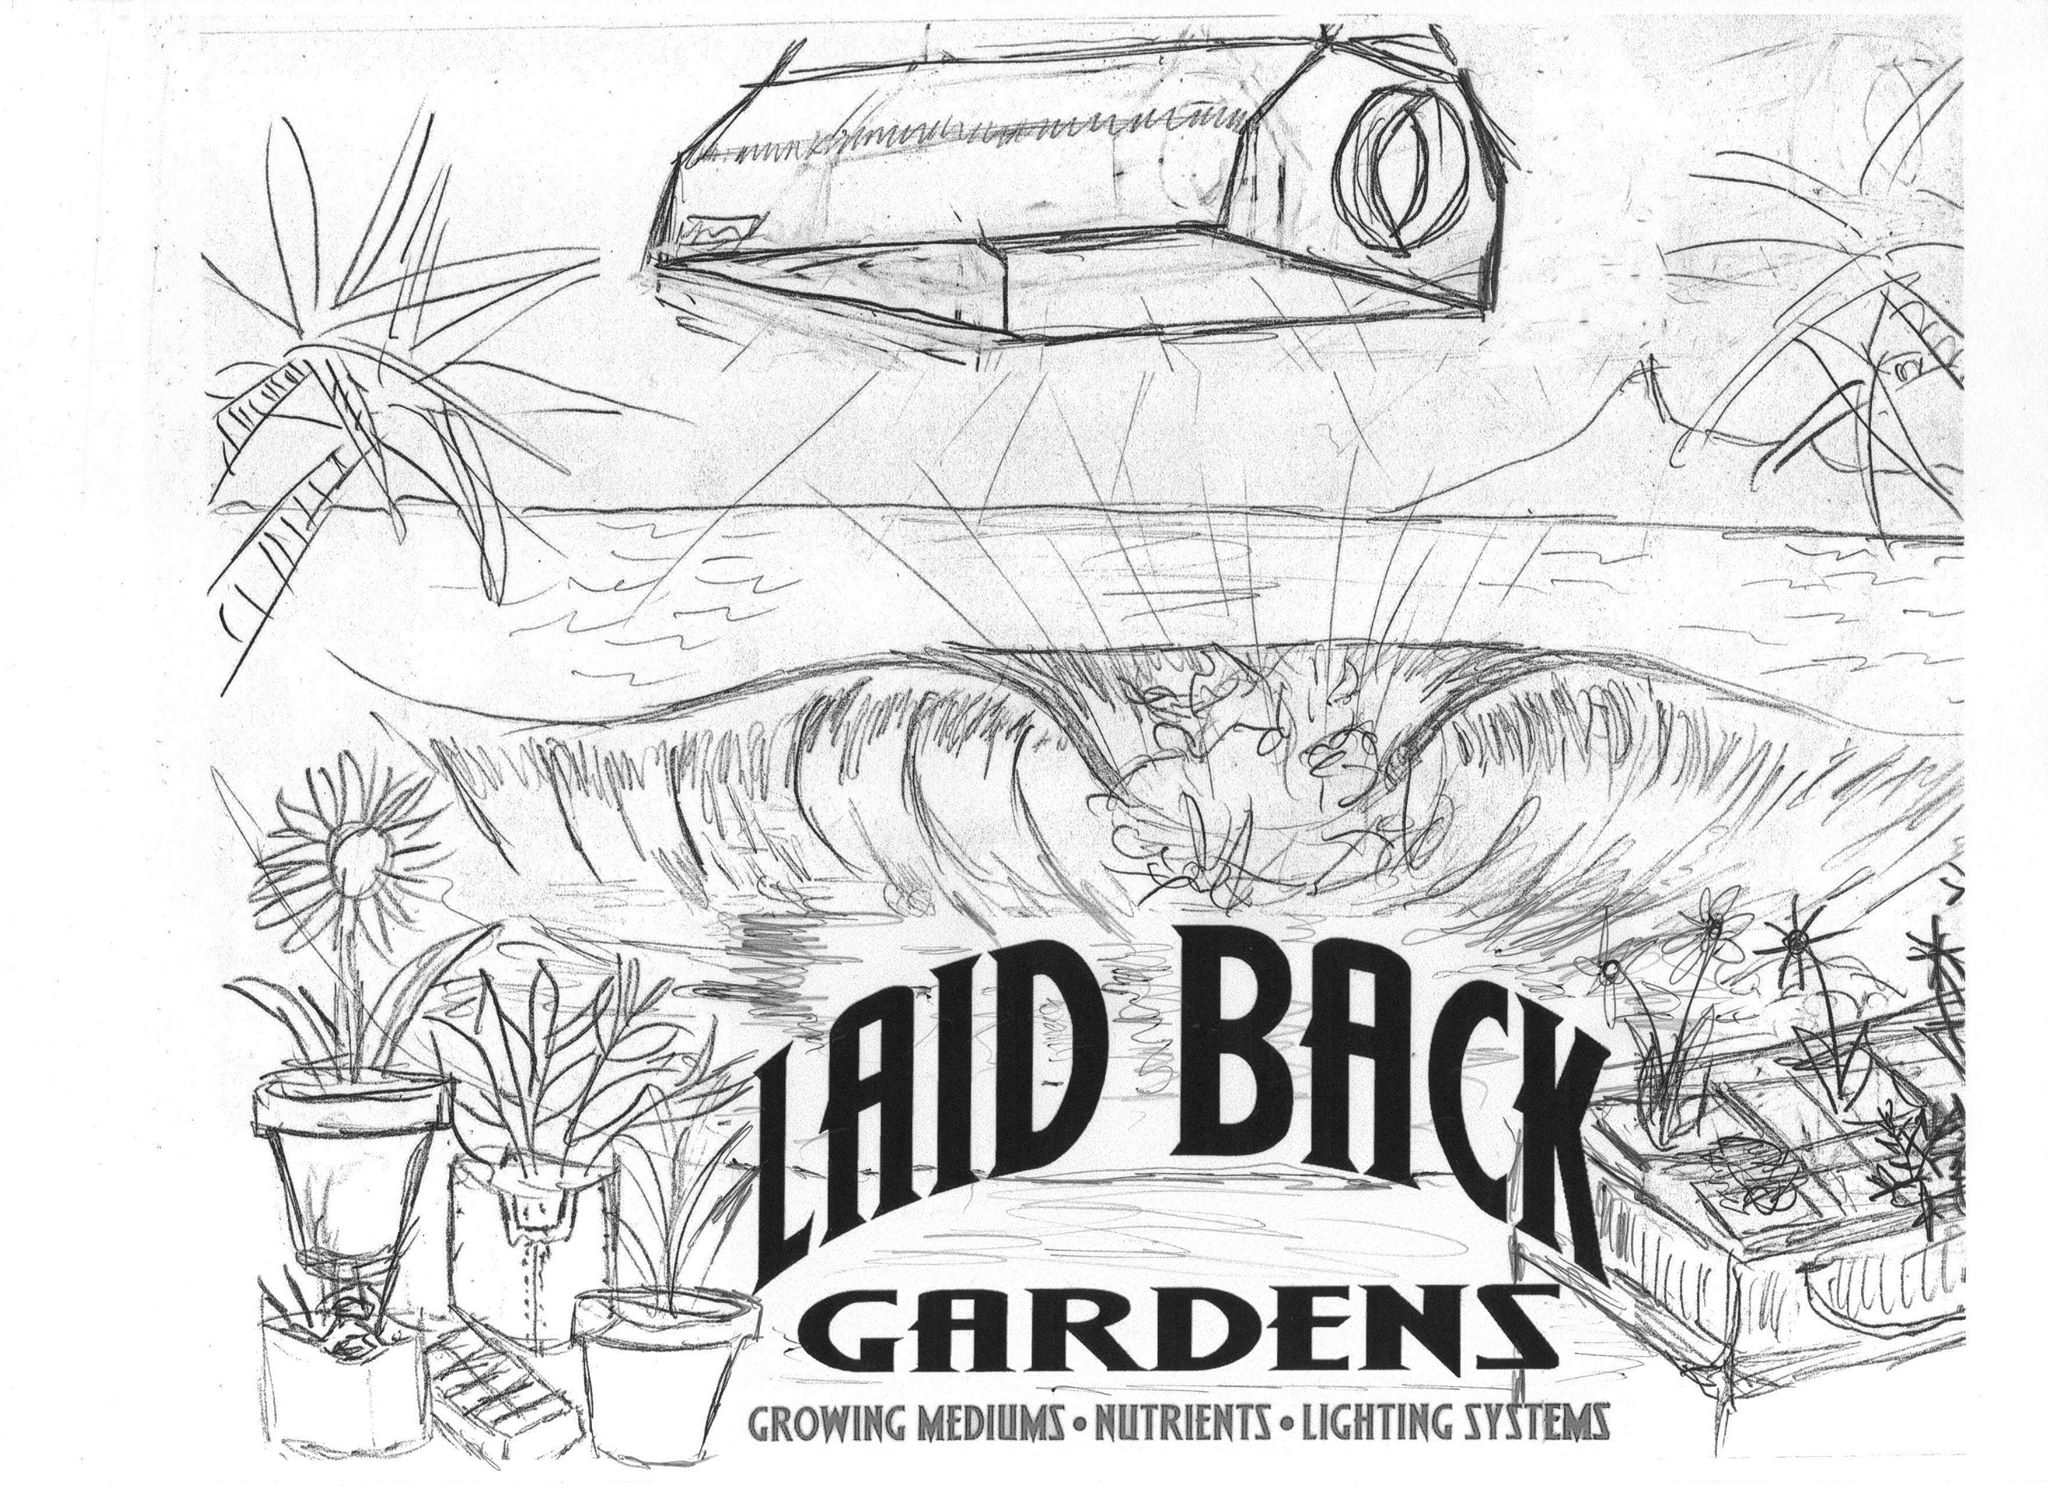 Laid Back Gardens logo